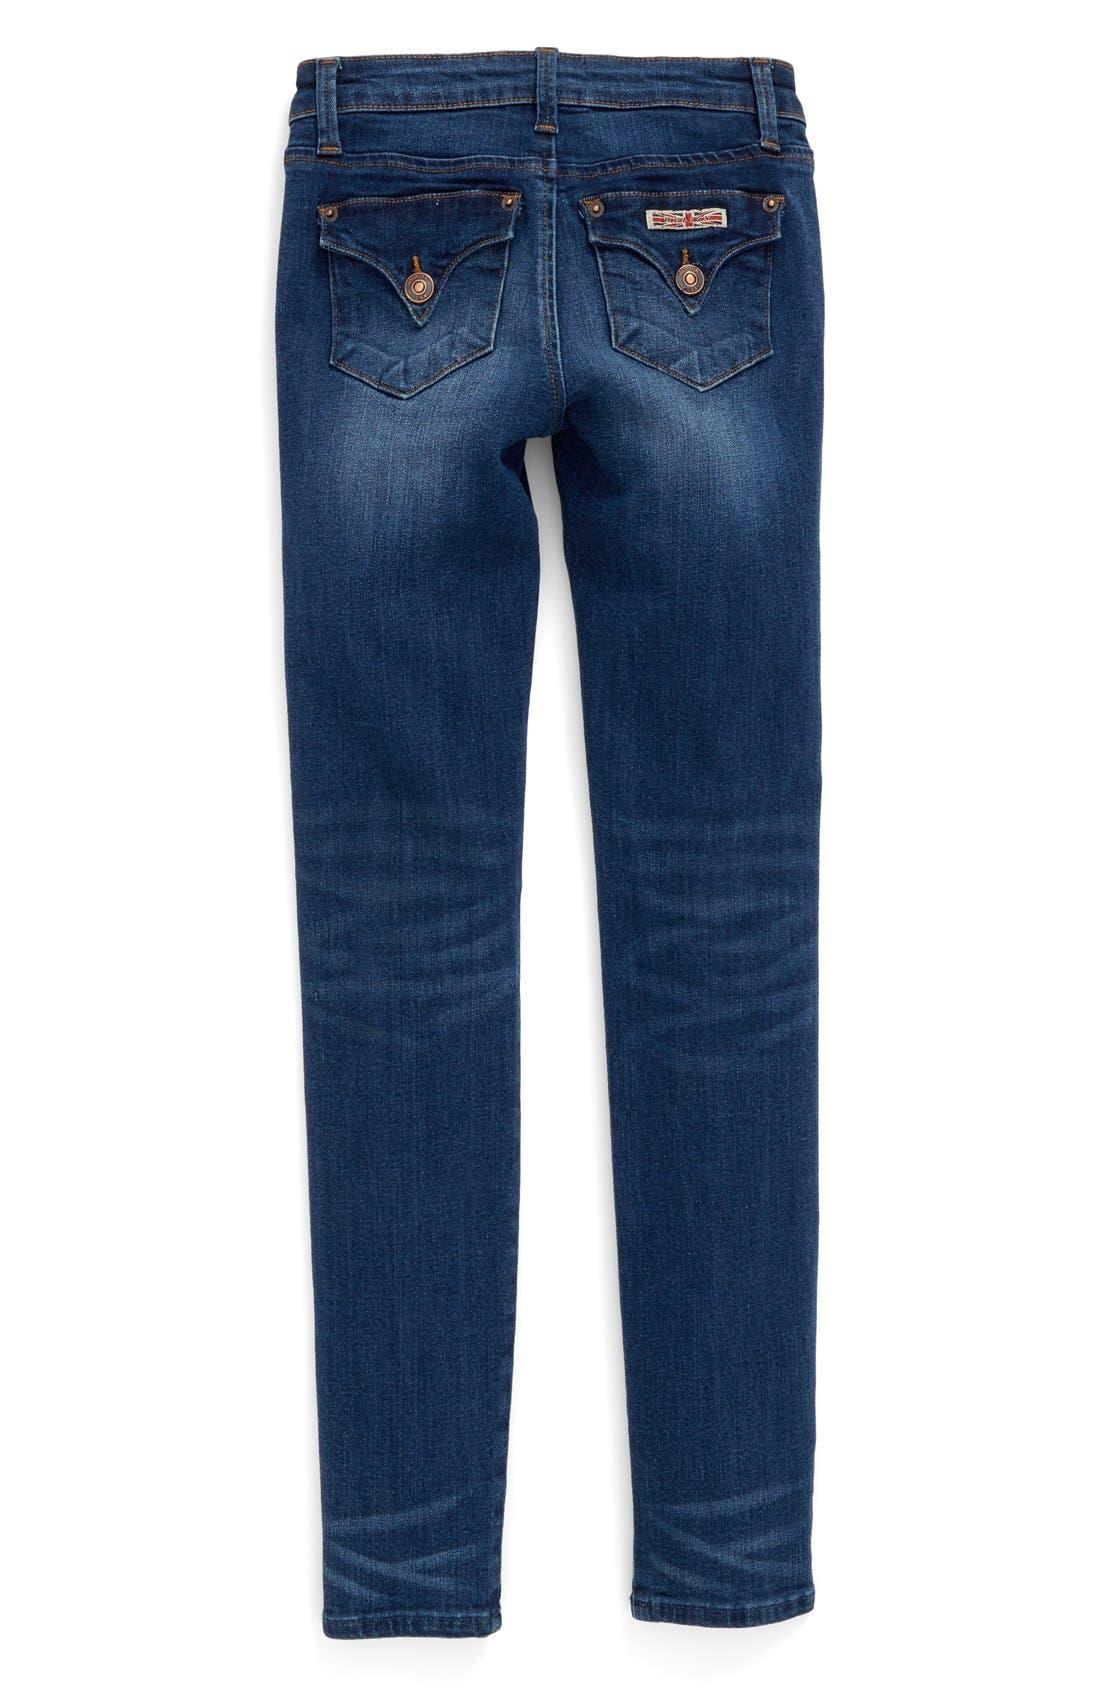 HUDSON KIDS, 'Collin' Skinny Jeans, Alternate thumbnail 3, color, 484